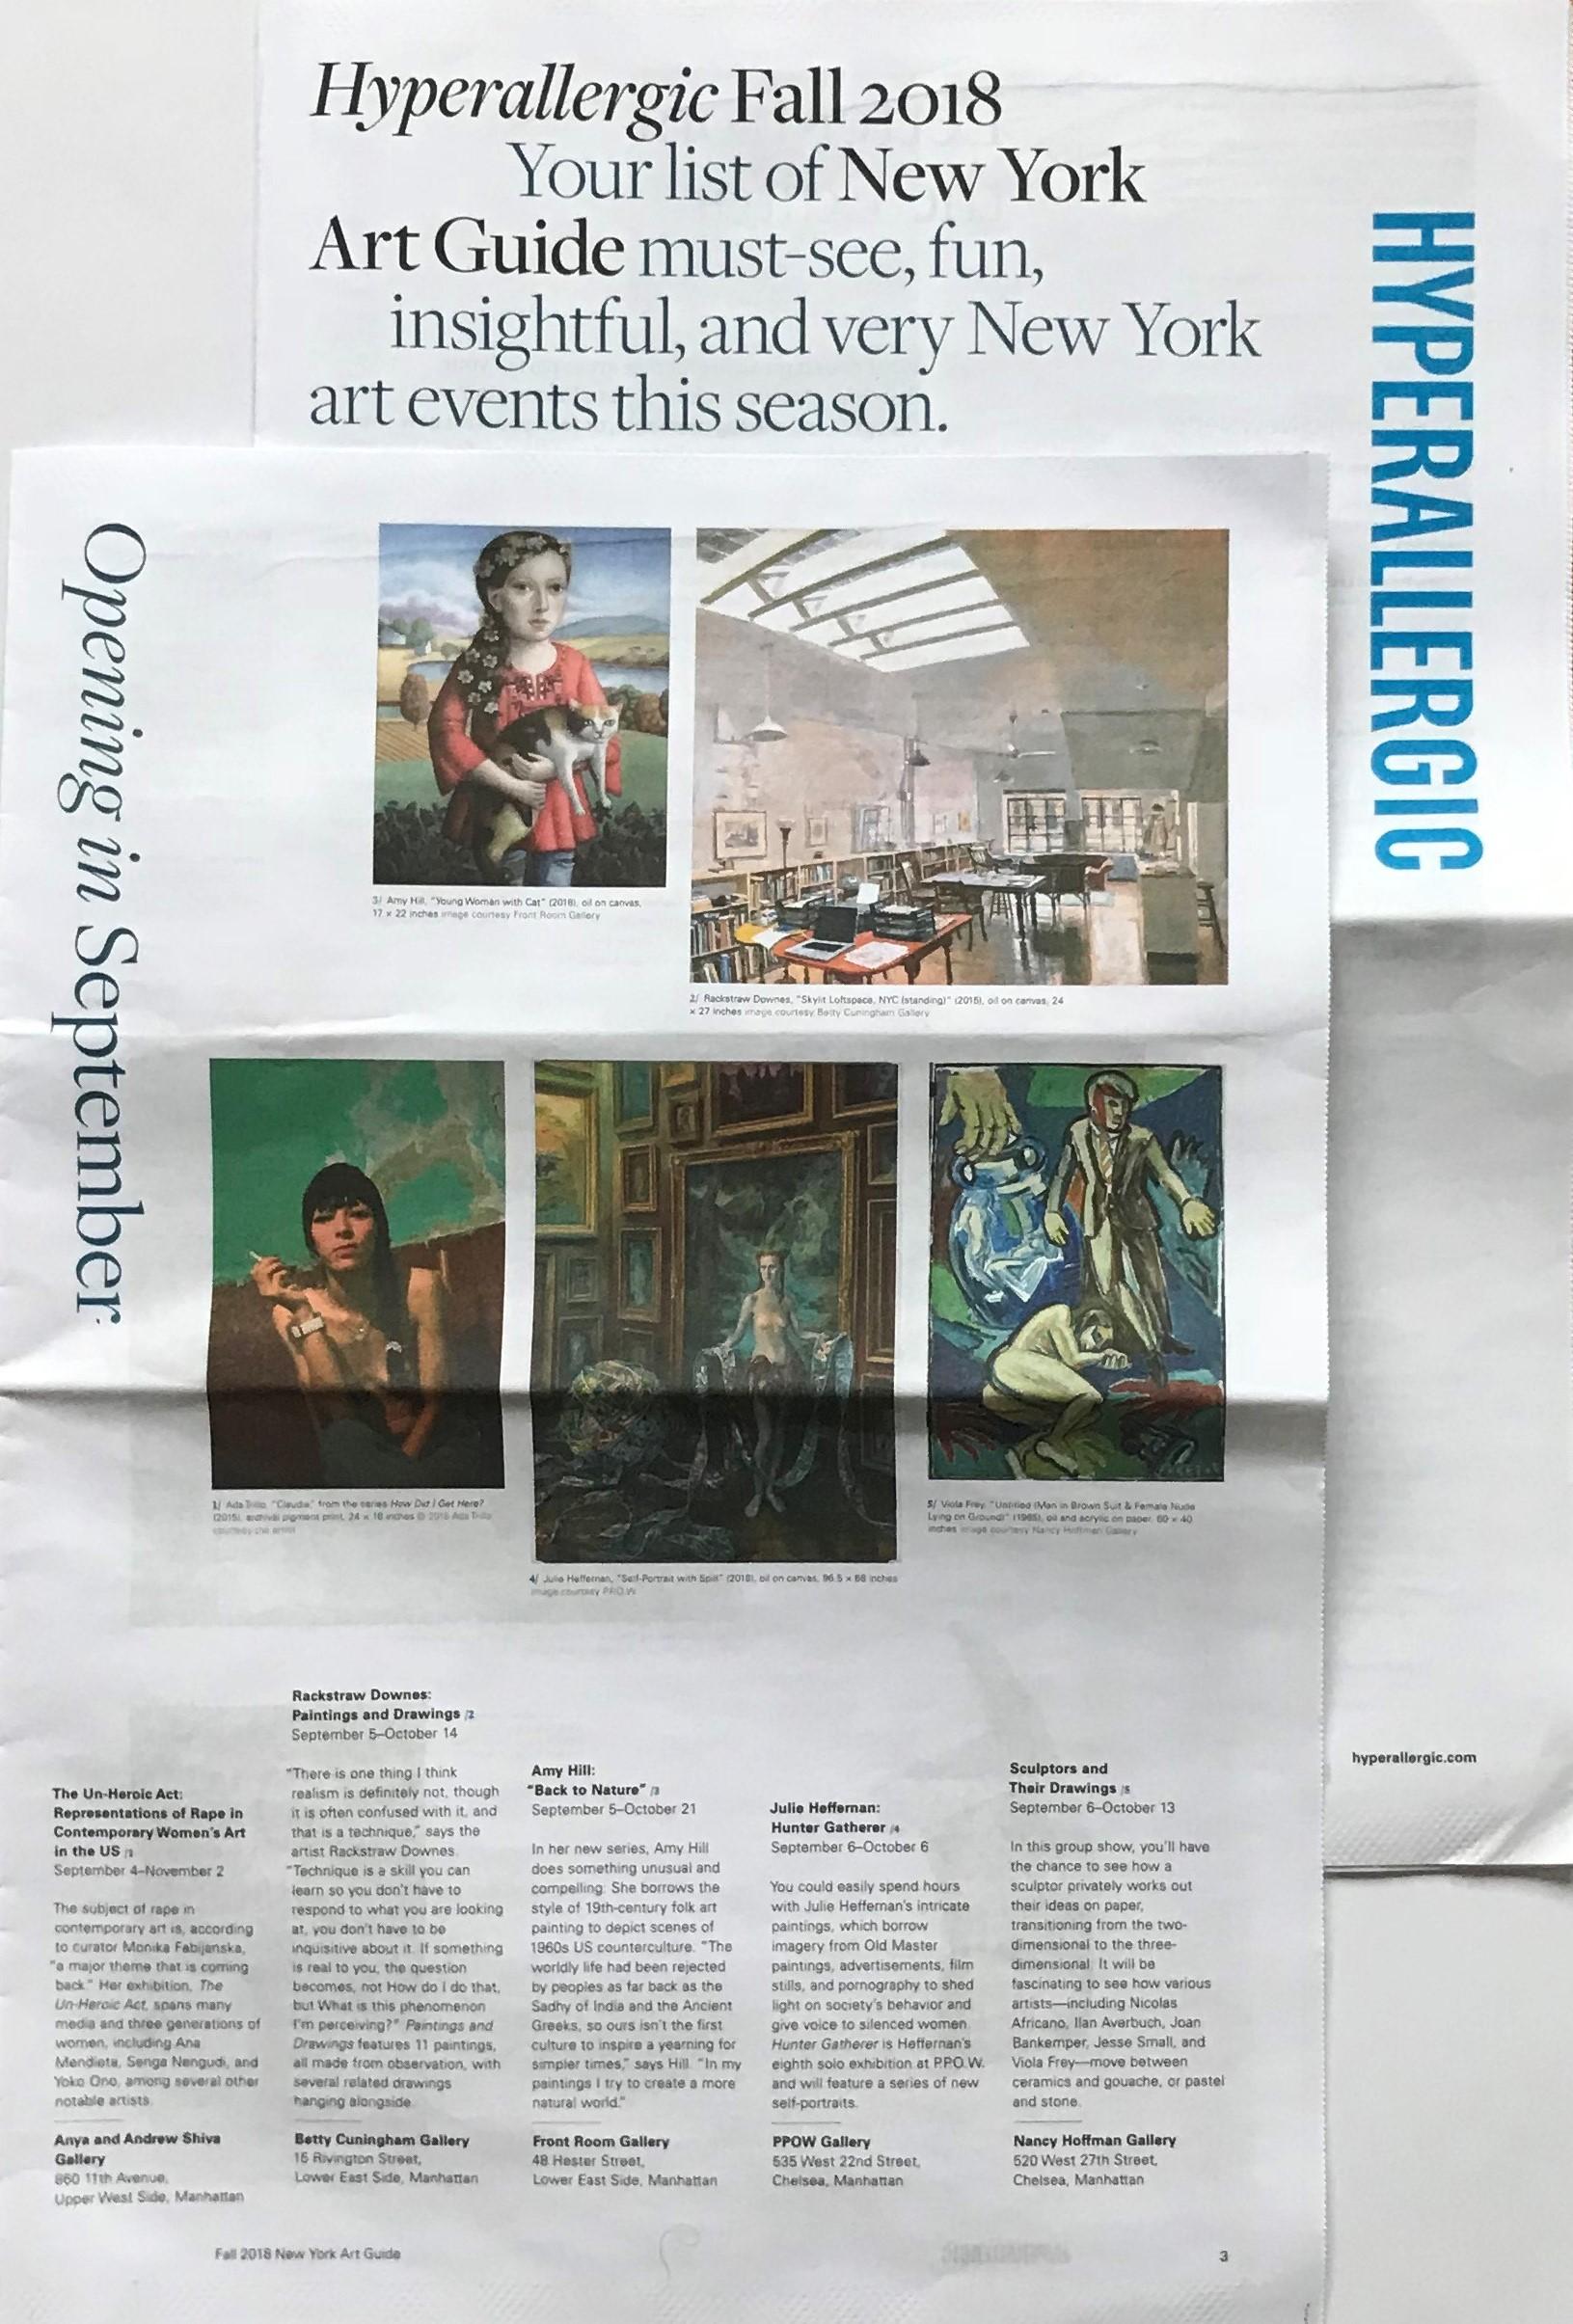 Hyperallergic Fall 2018 Art Guide